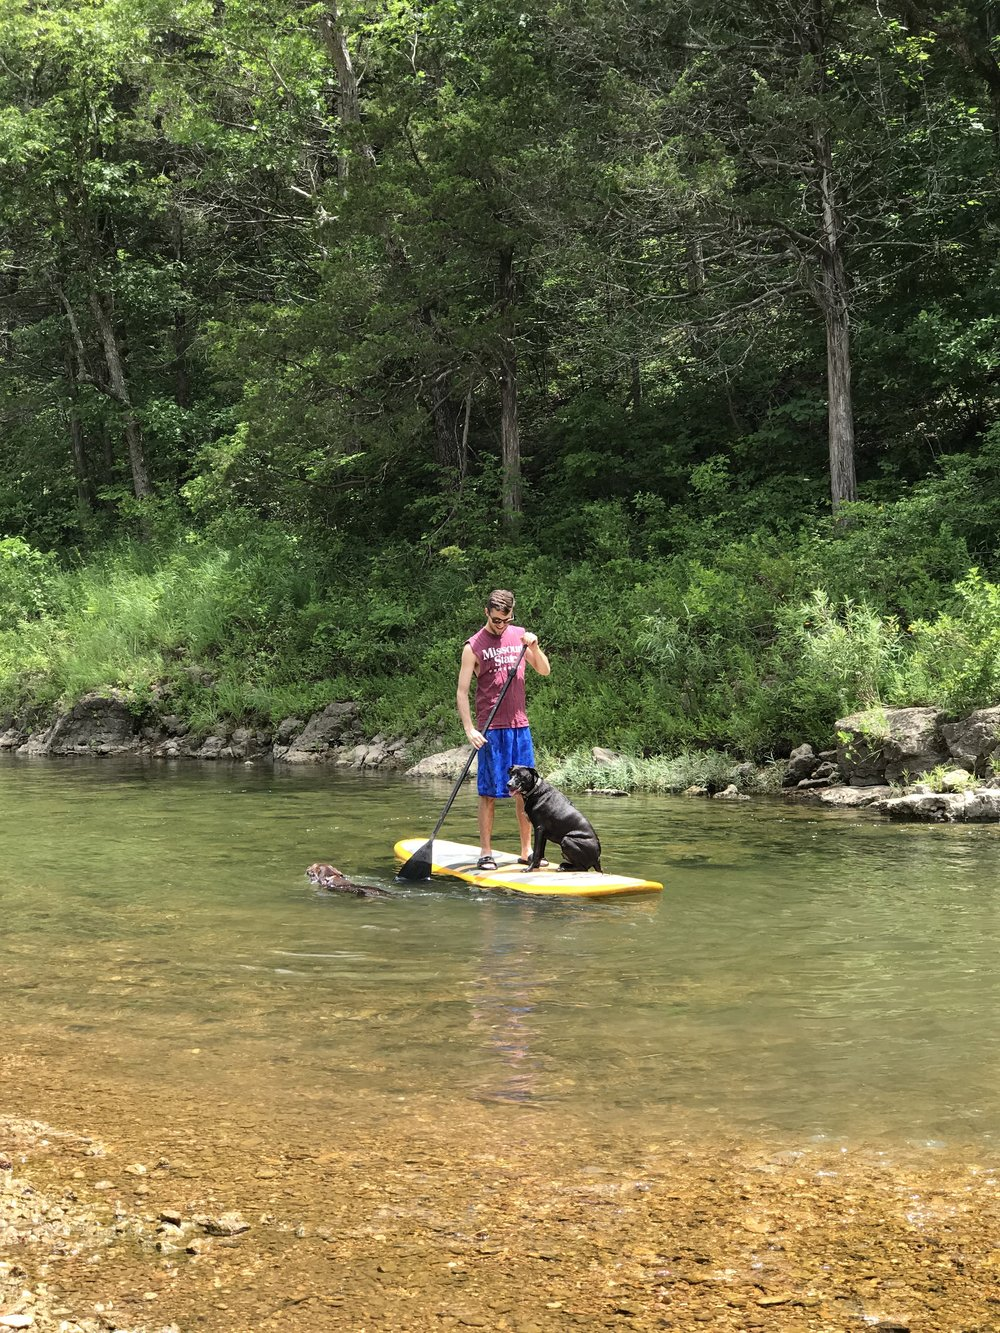 Paddle boarding on the Huzzah Creek